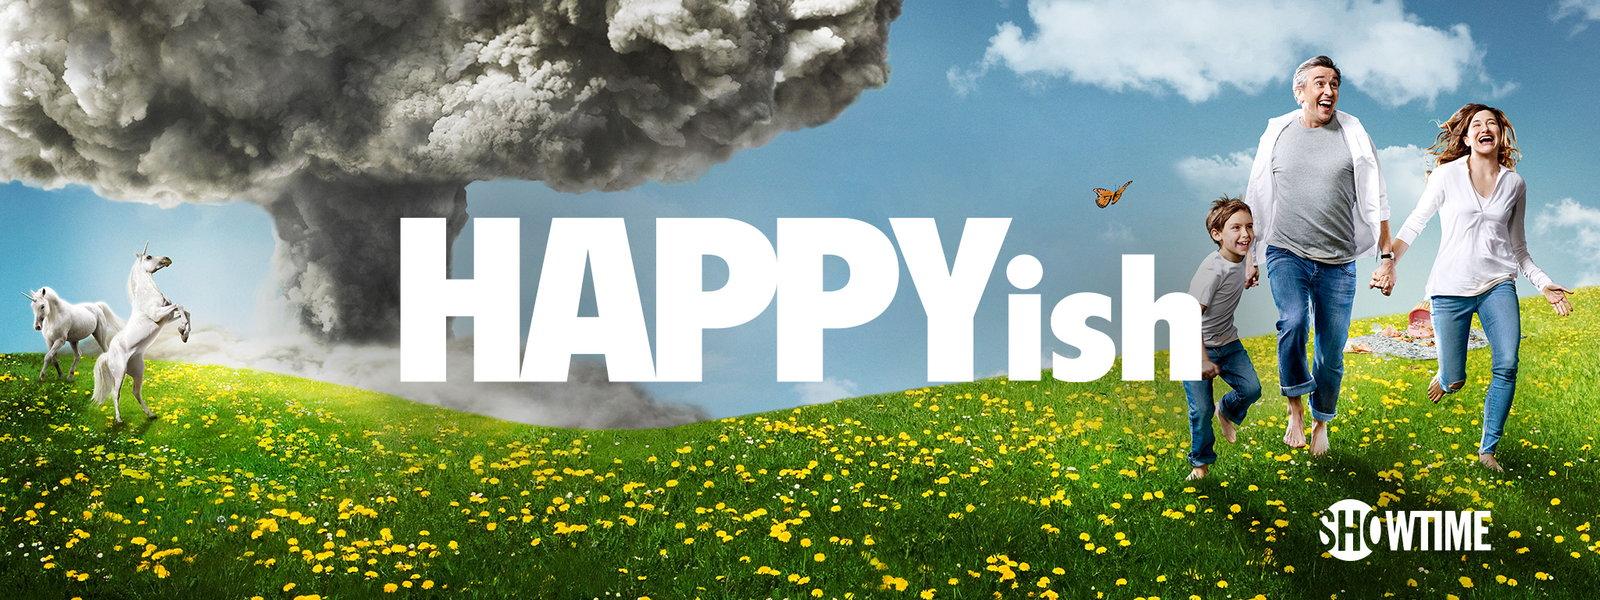 happyish_poster